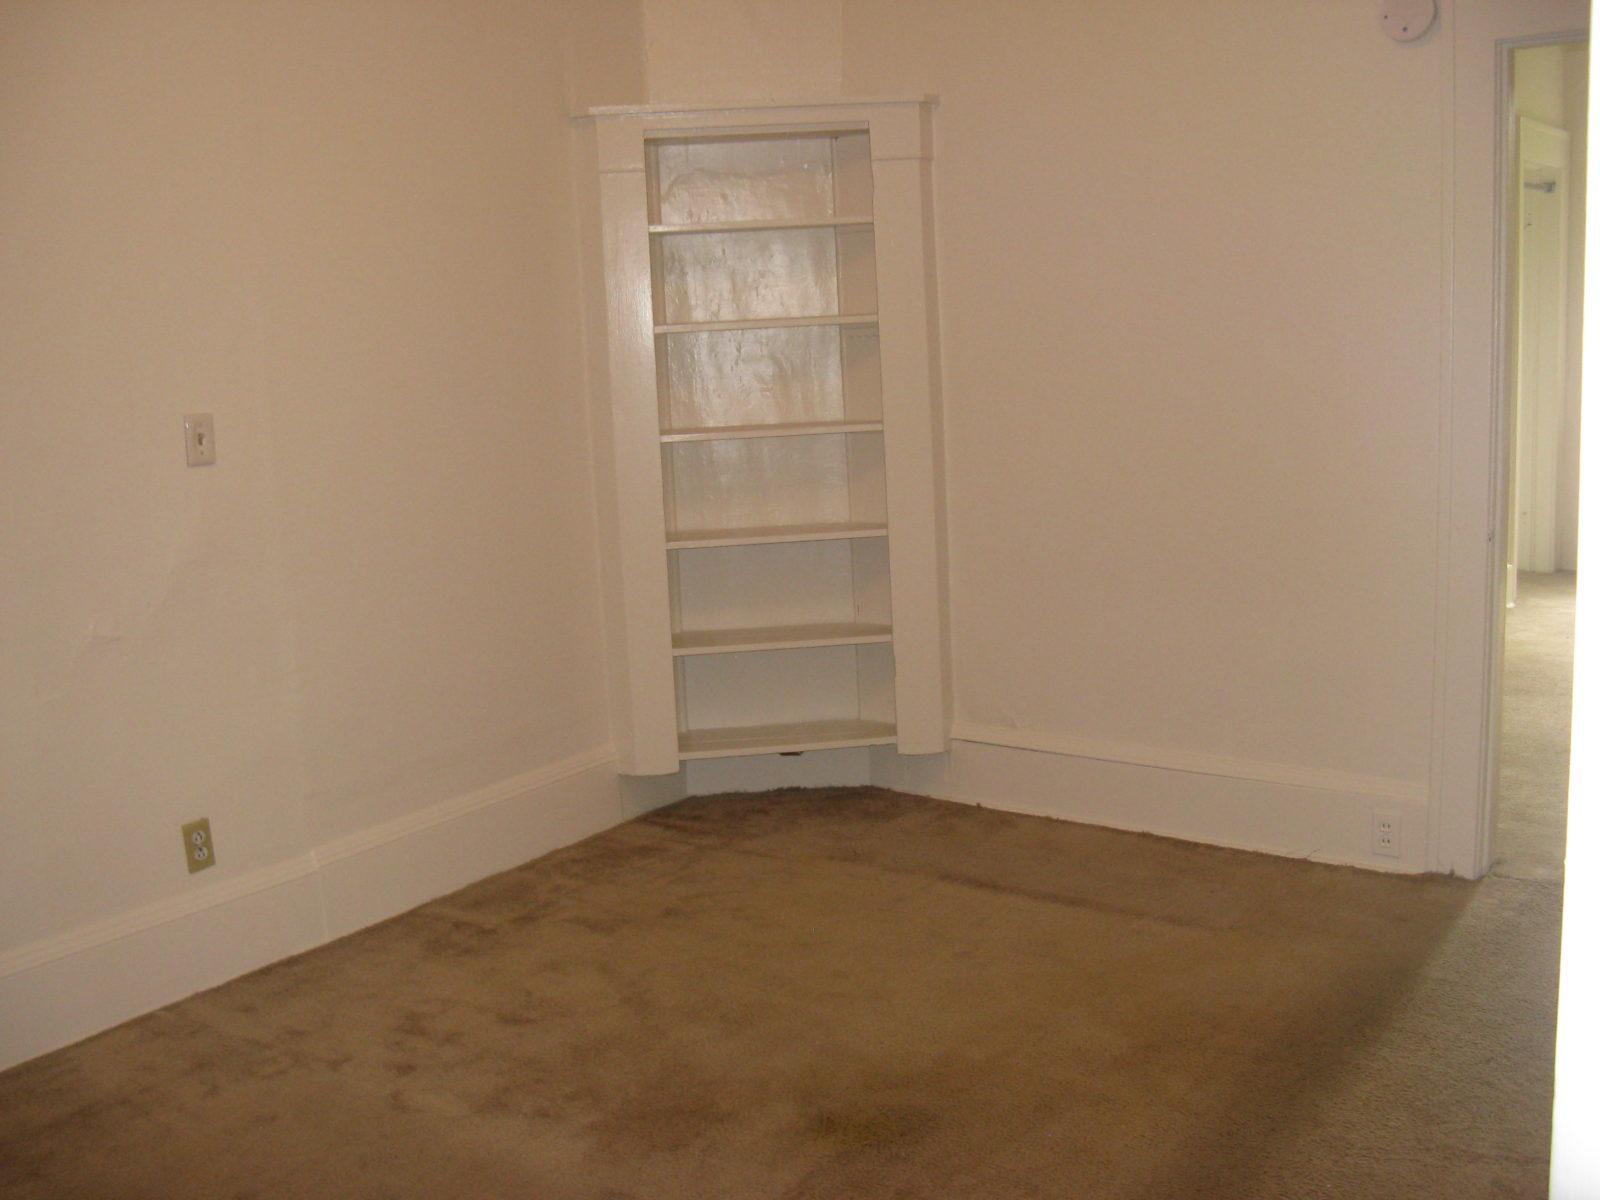 2473: Bedroom next to Bath